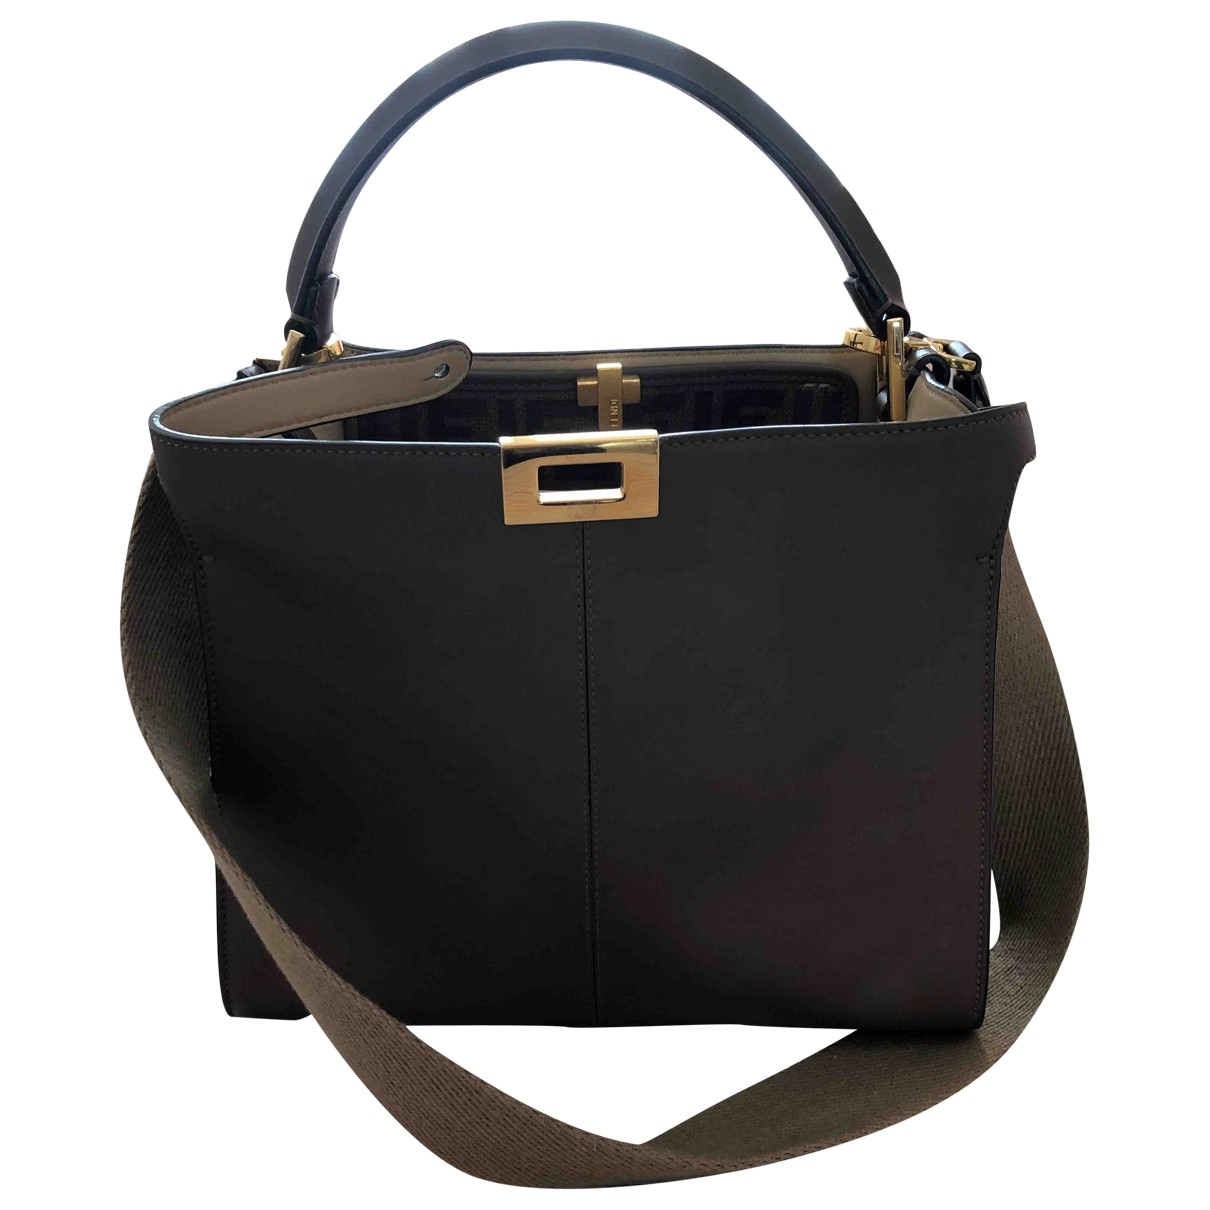 Fendi Peekaboo Brown Leather handbag for Women \N